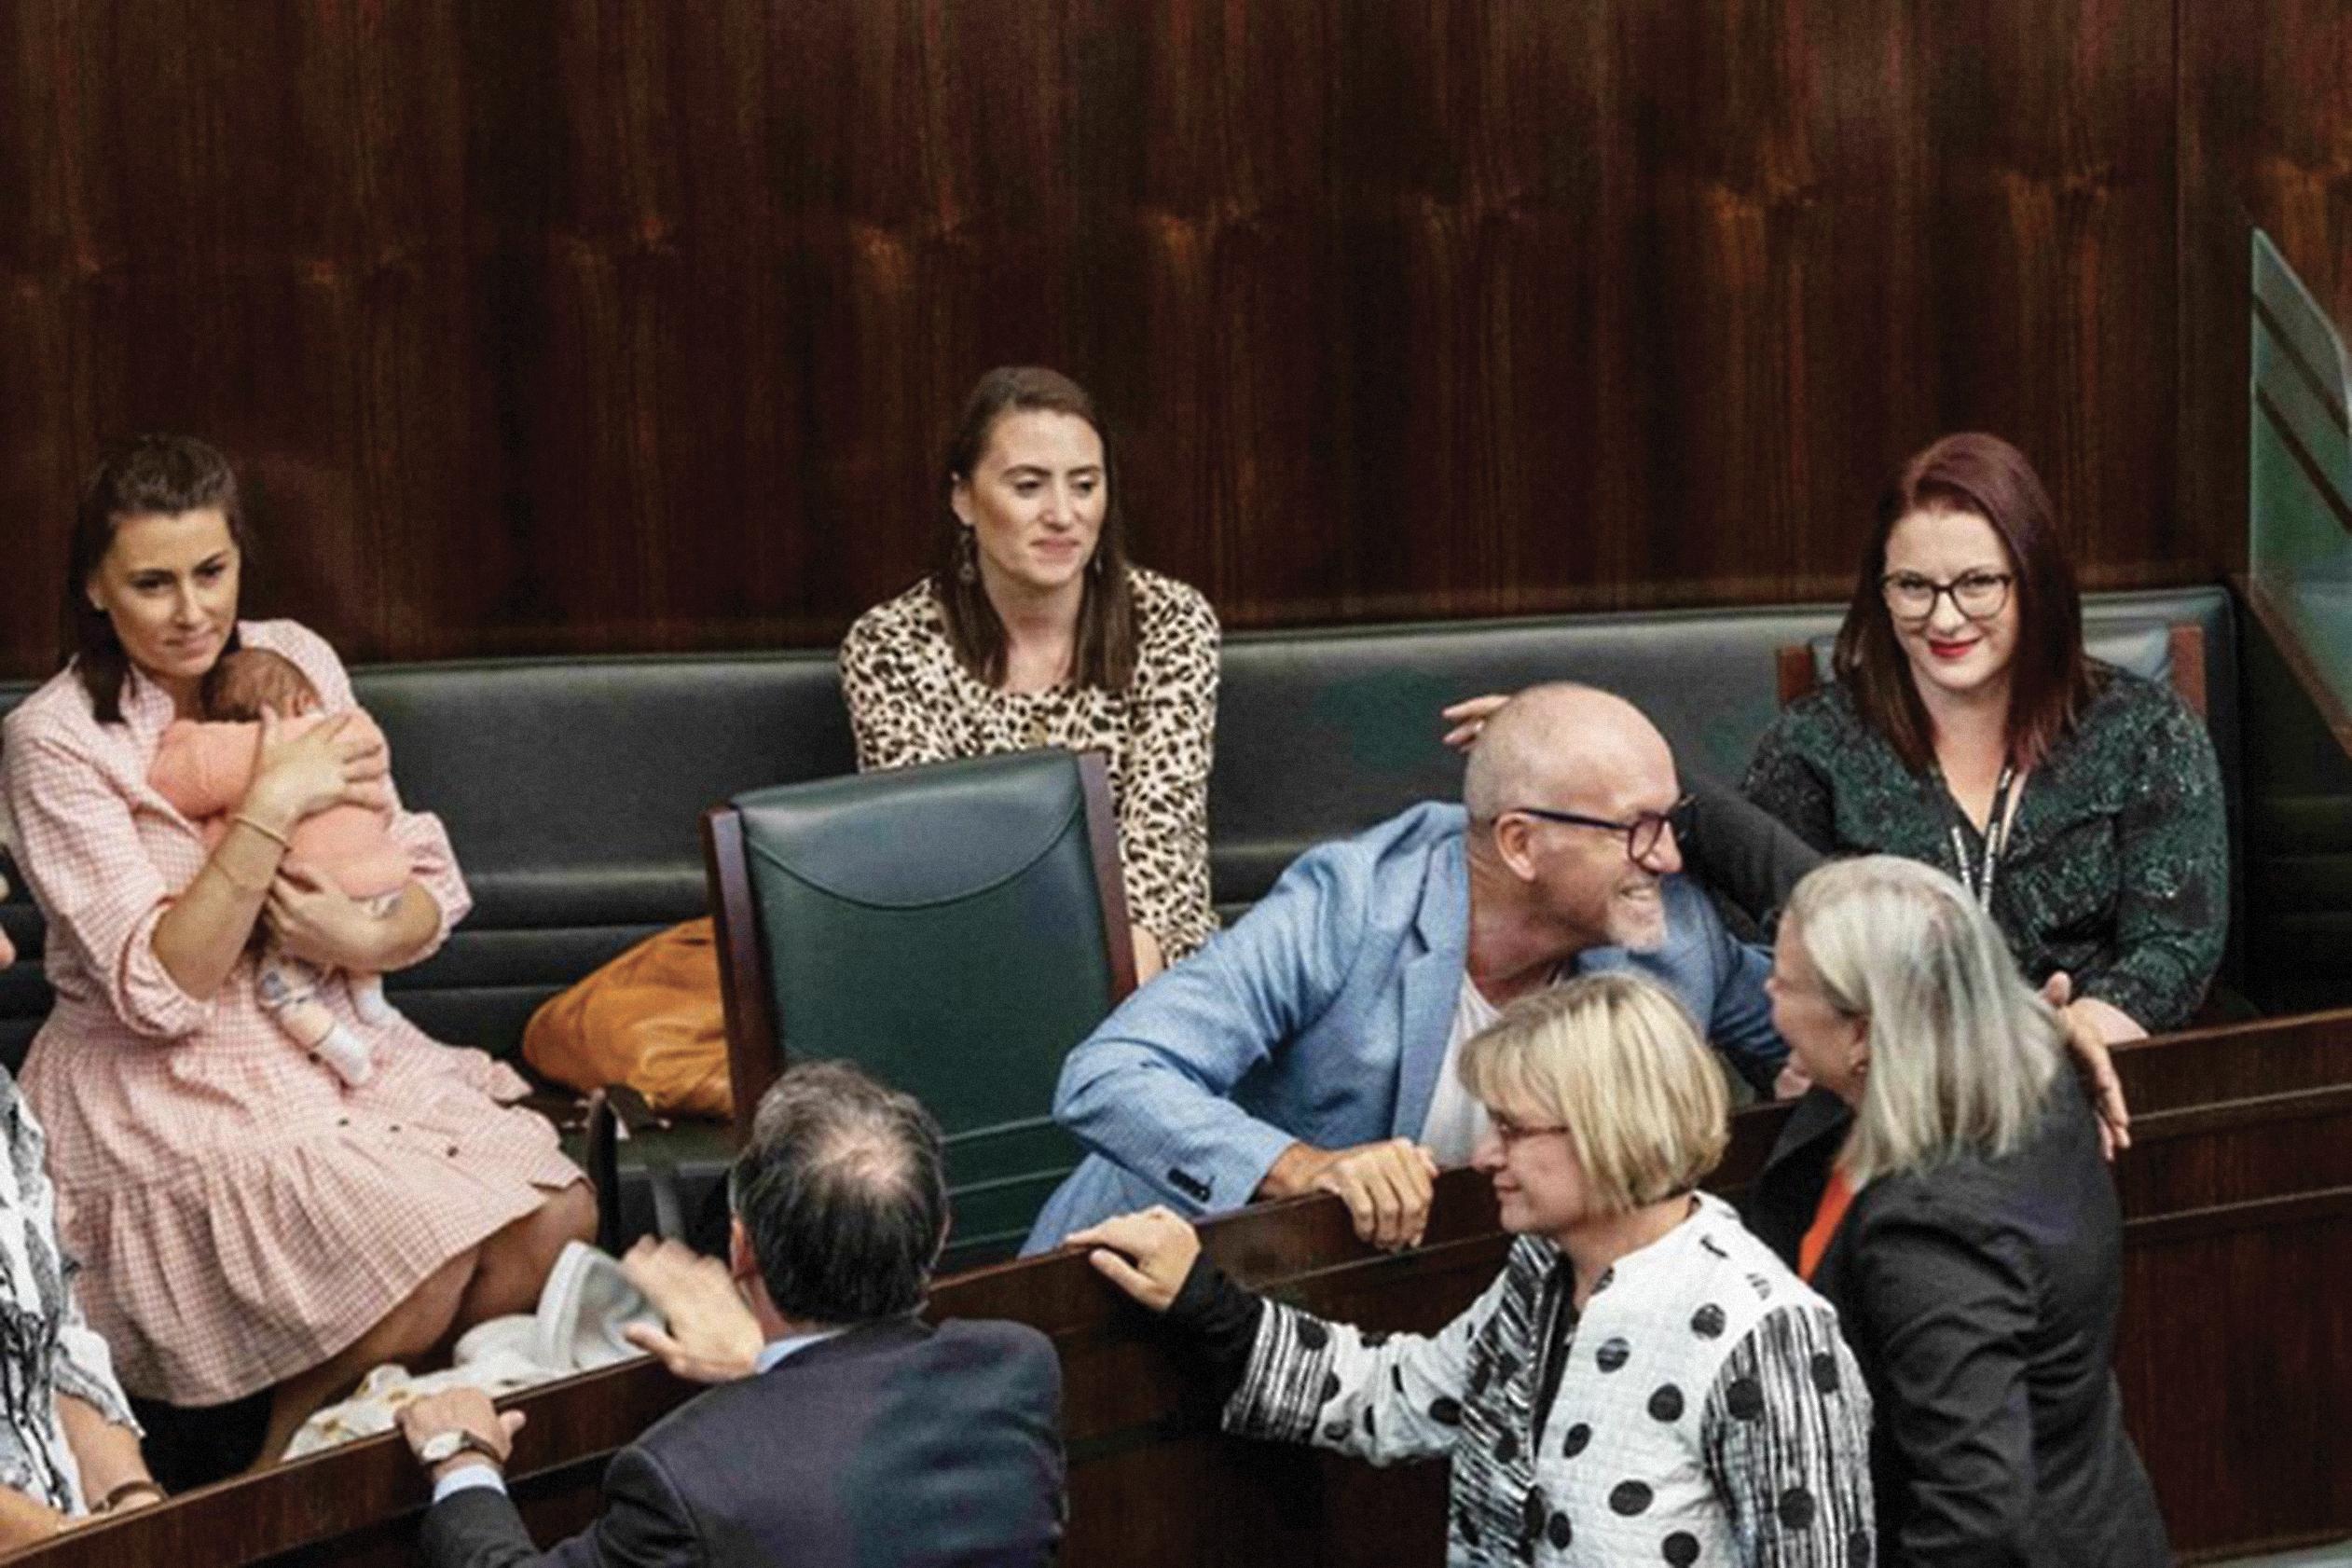 Celebratory scenes in Tasmania's Parliament